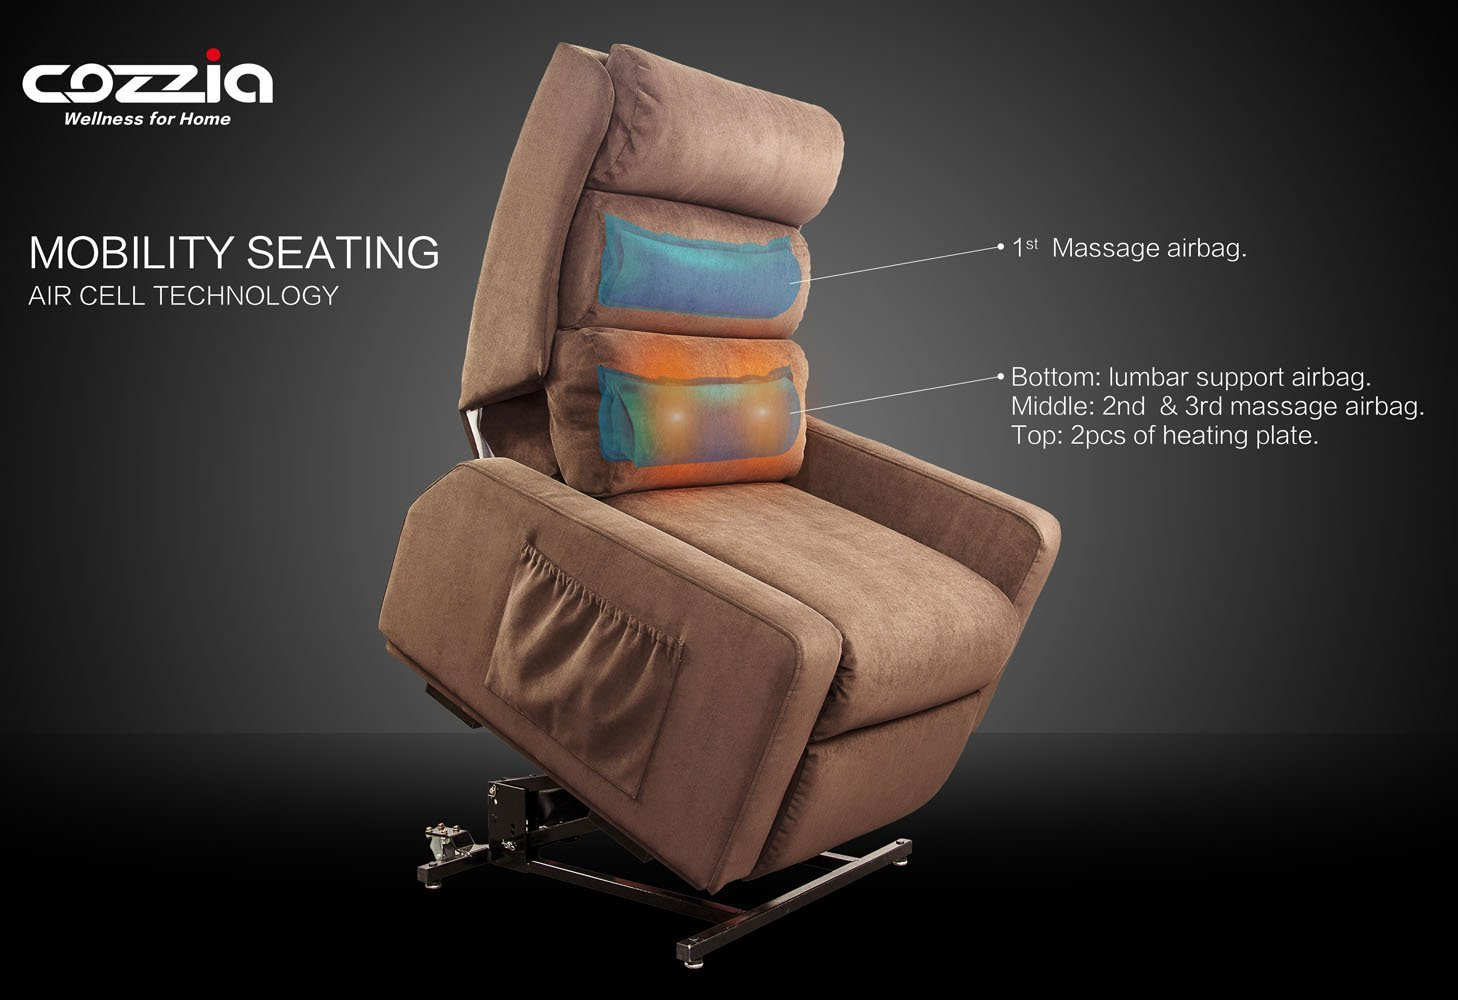 cozzia mc520 layflat infinite position lift chair recliner